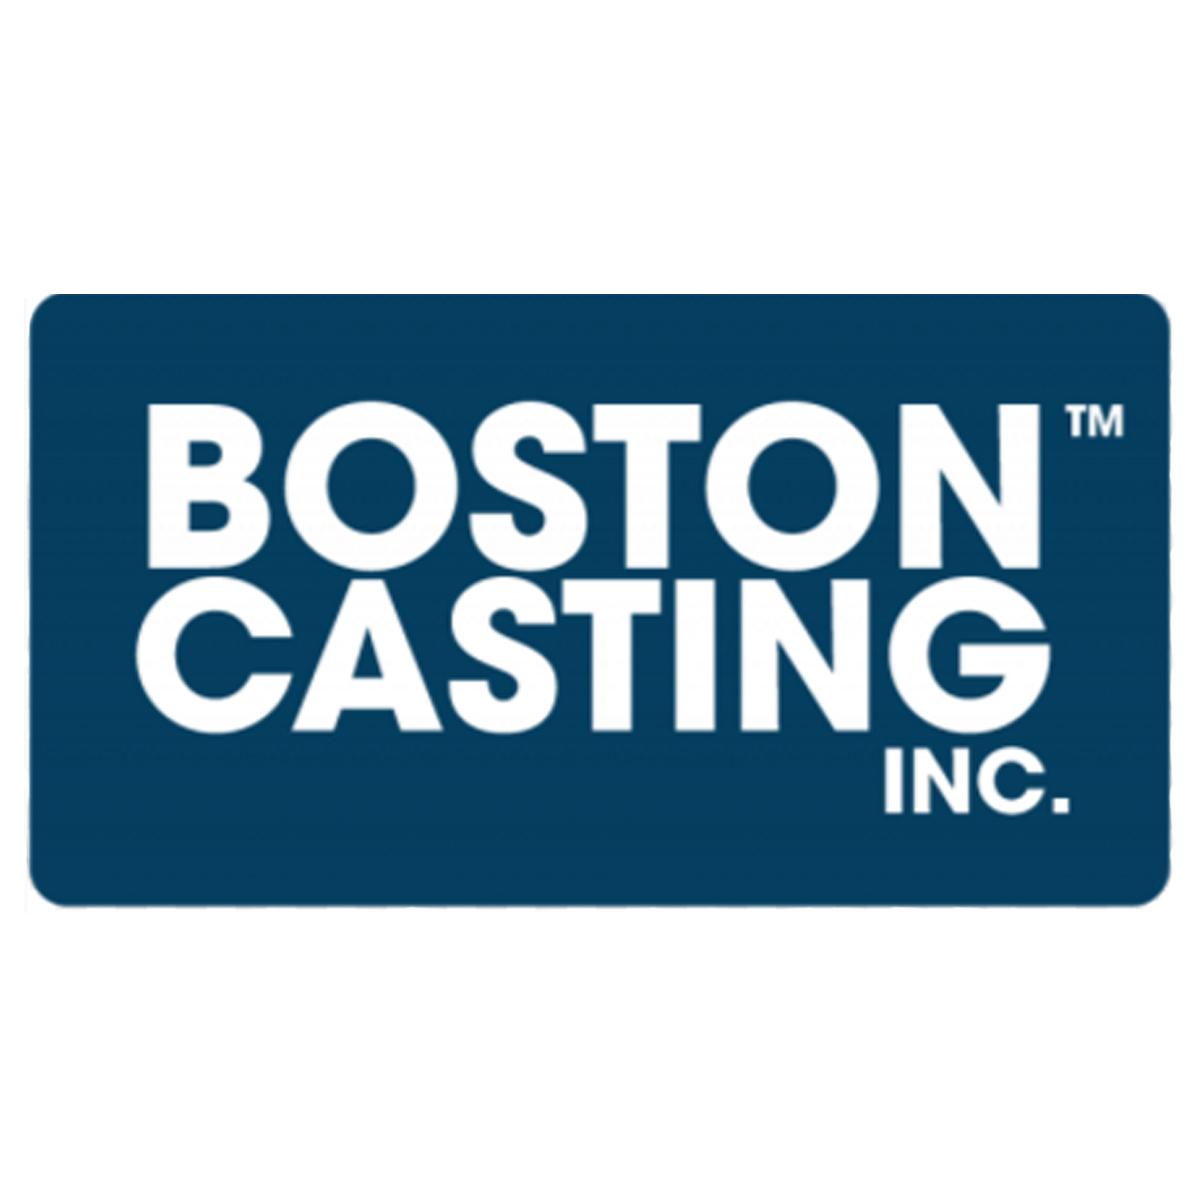 Boston CASting Sq.jpg